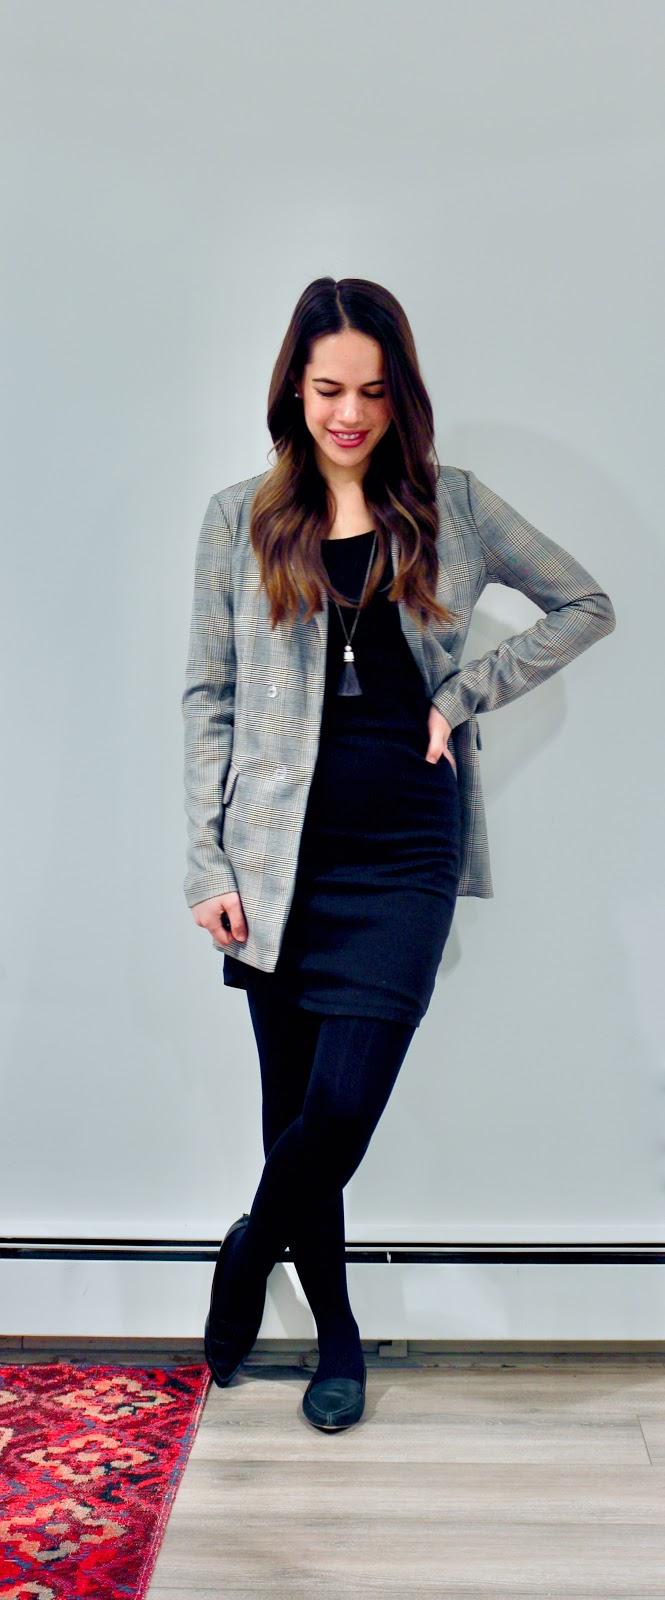 Jules in Flats - T-Shirt Dress + Oversized Plaid Blazer (Business Casual Winter Workwear on a Budget)